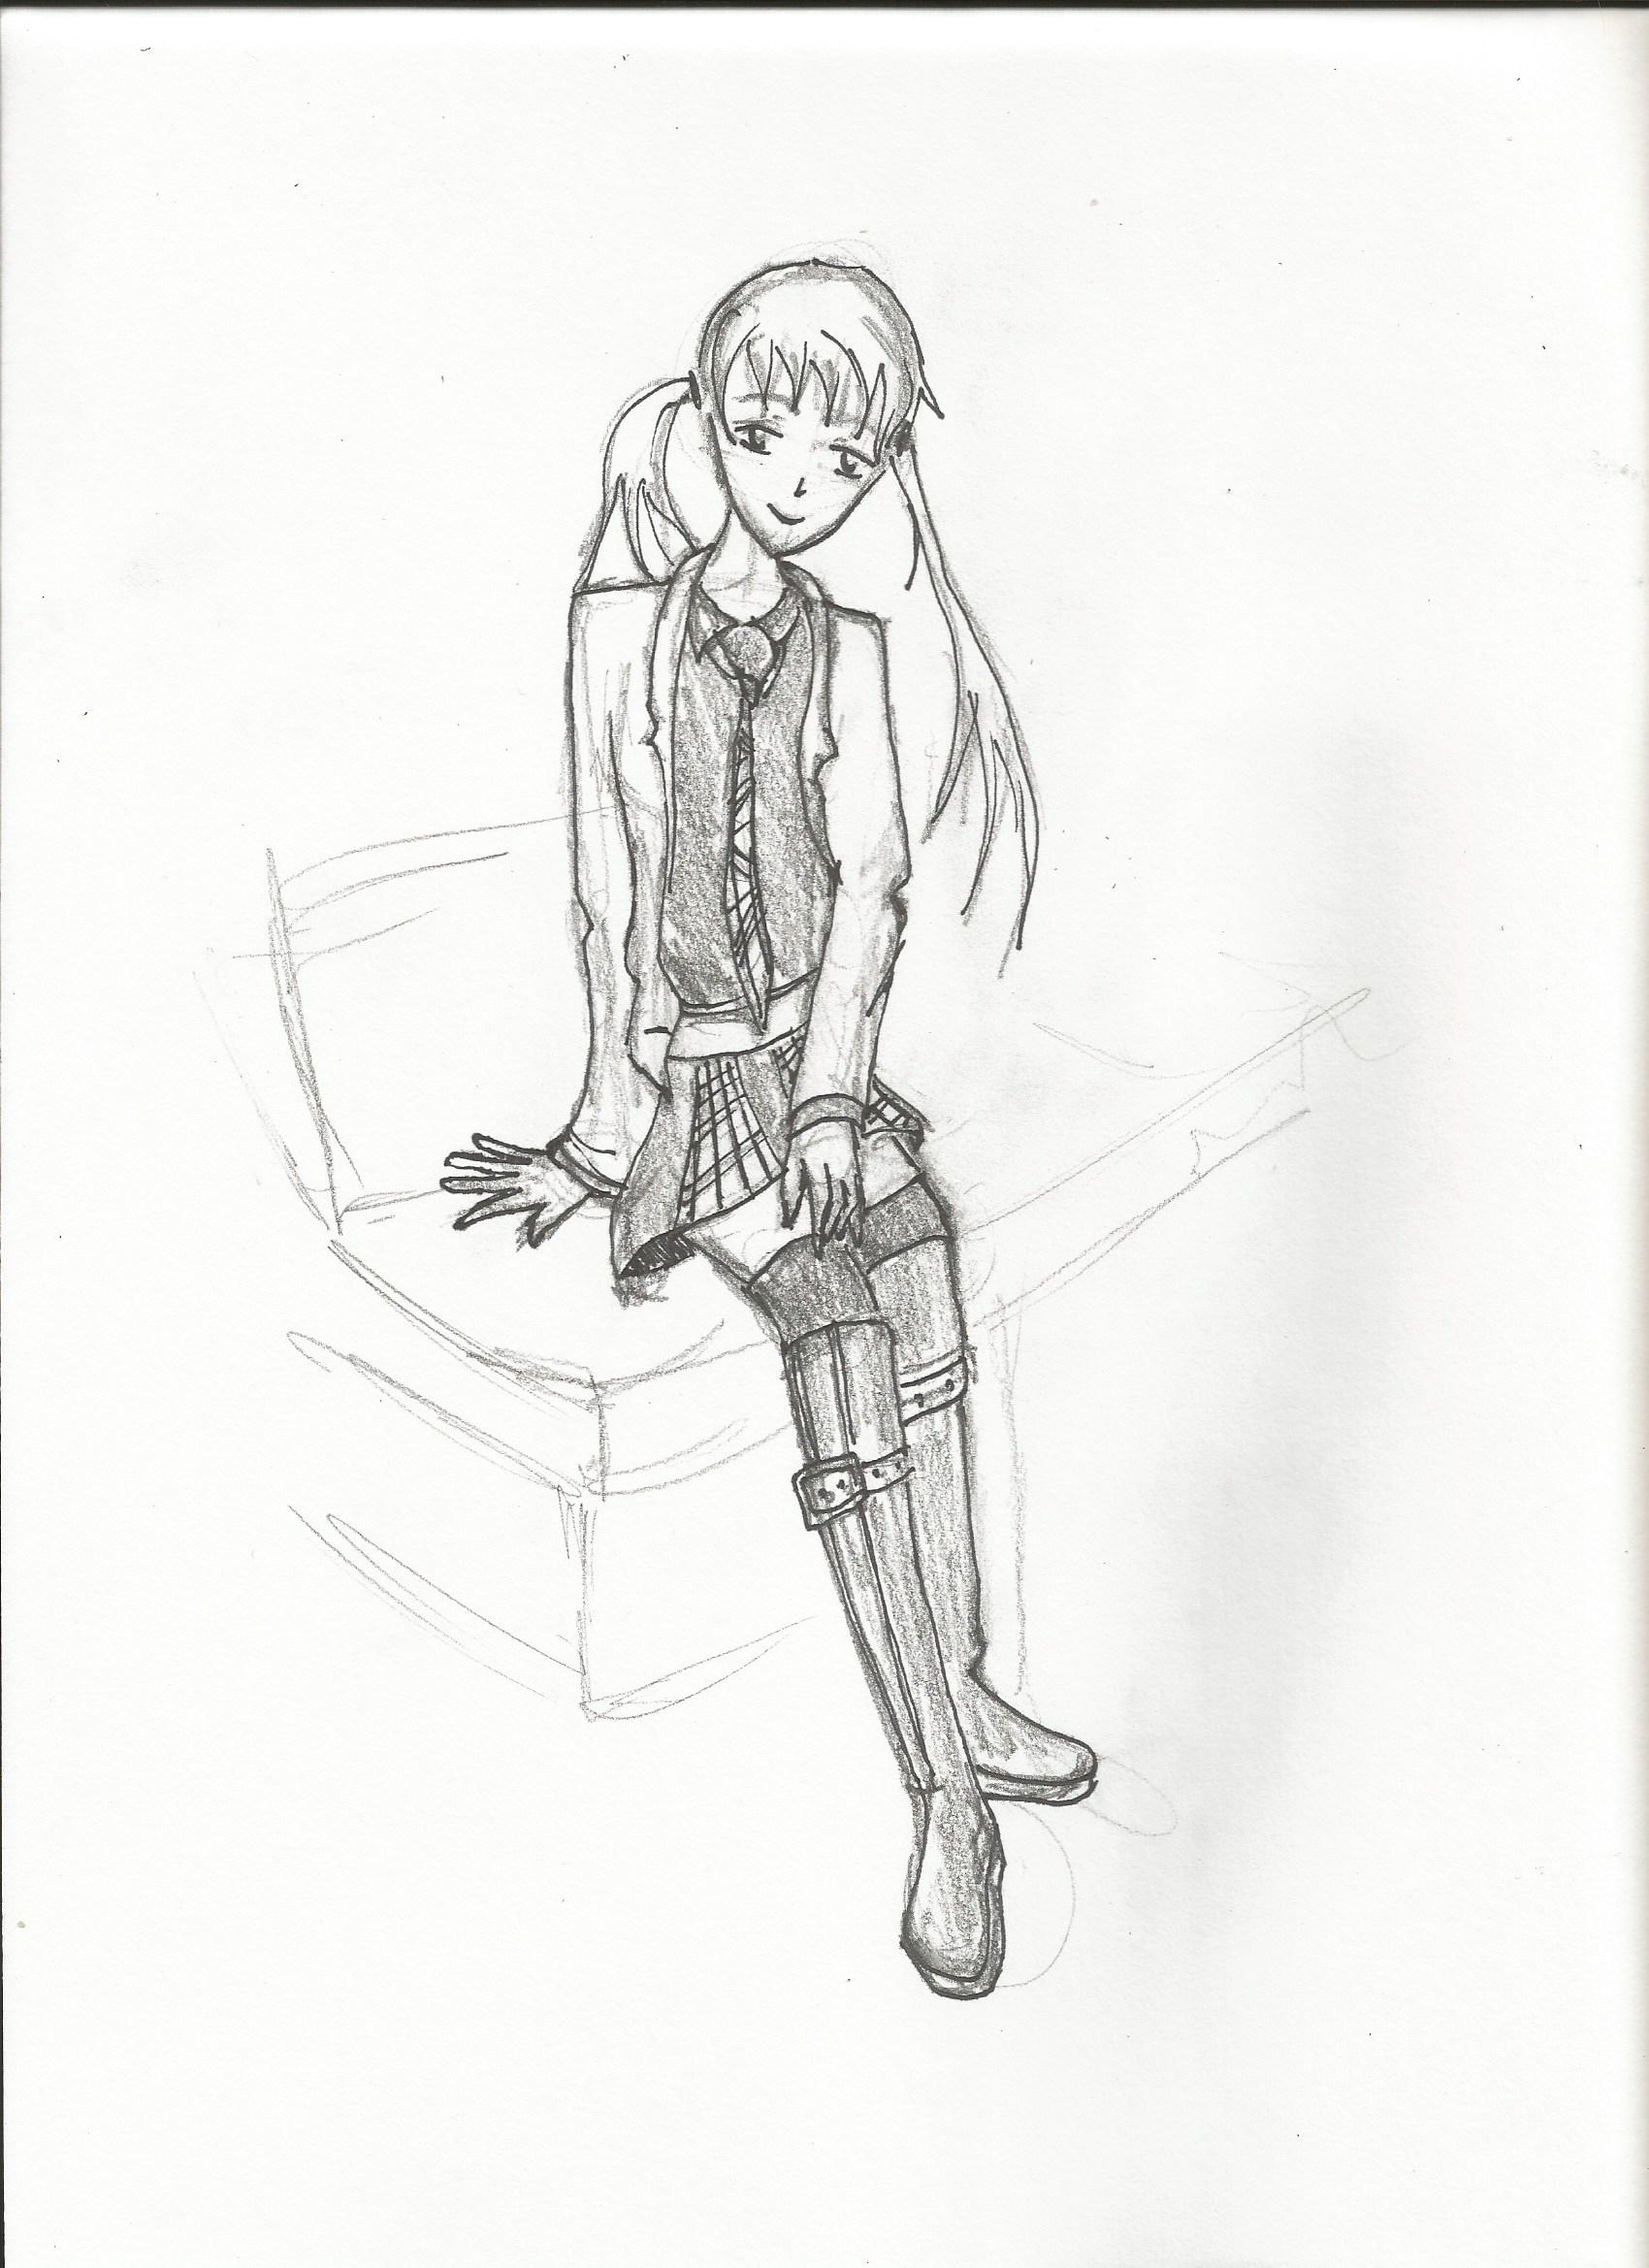 Manga girl sitting Pencil and Paper